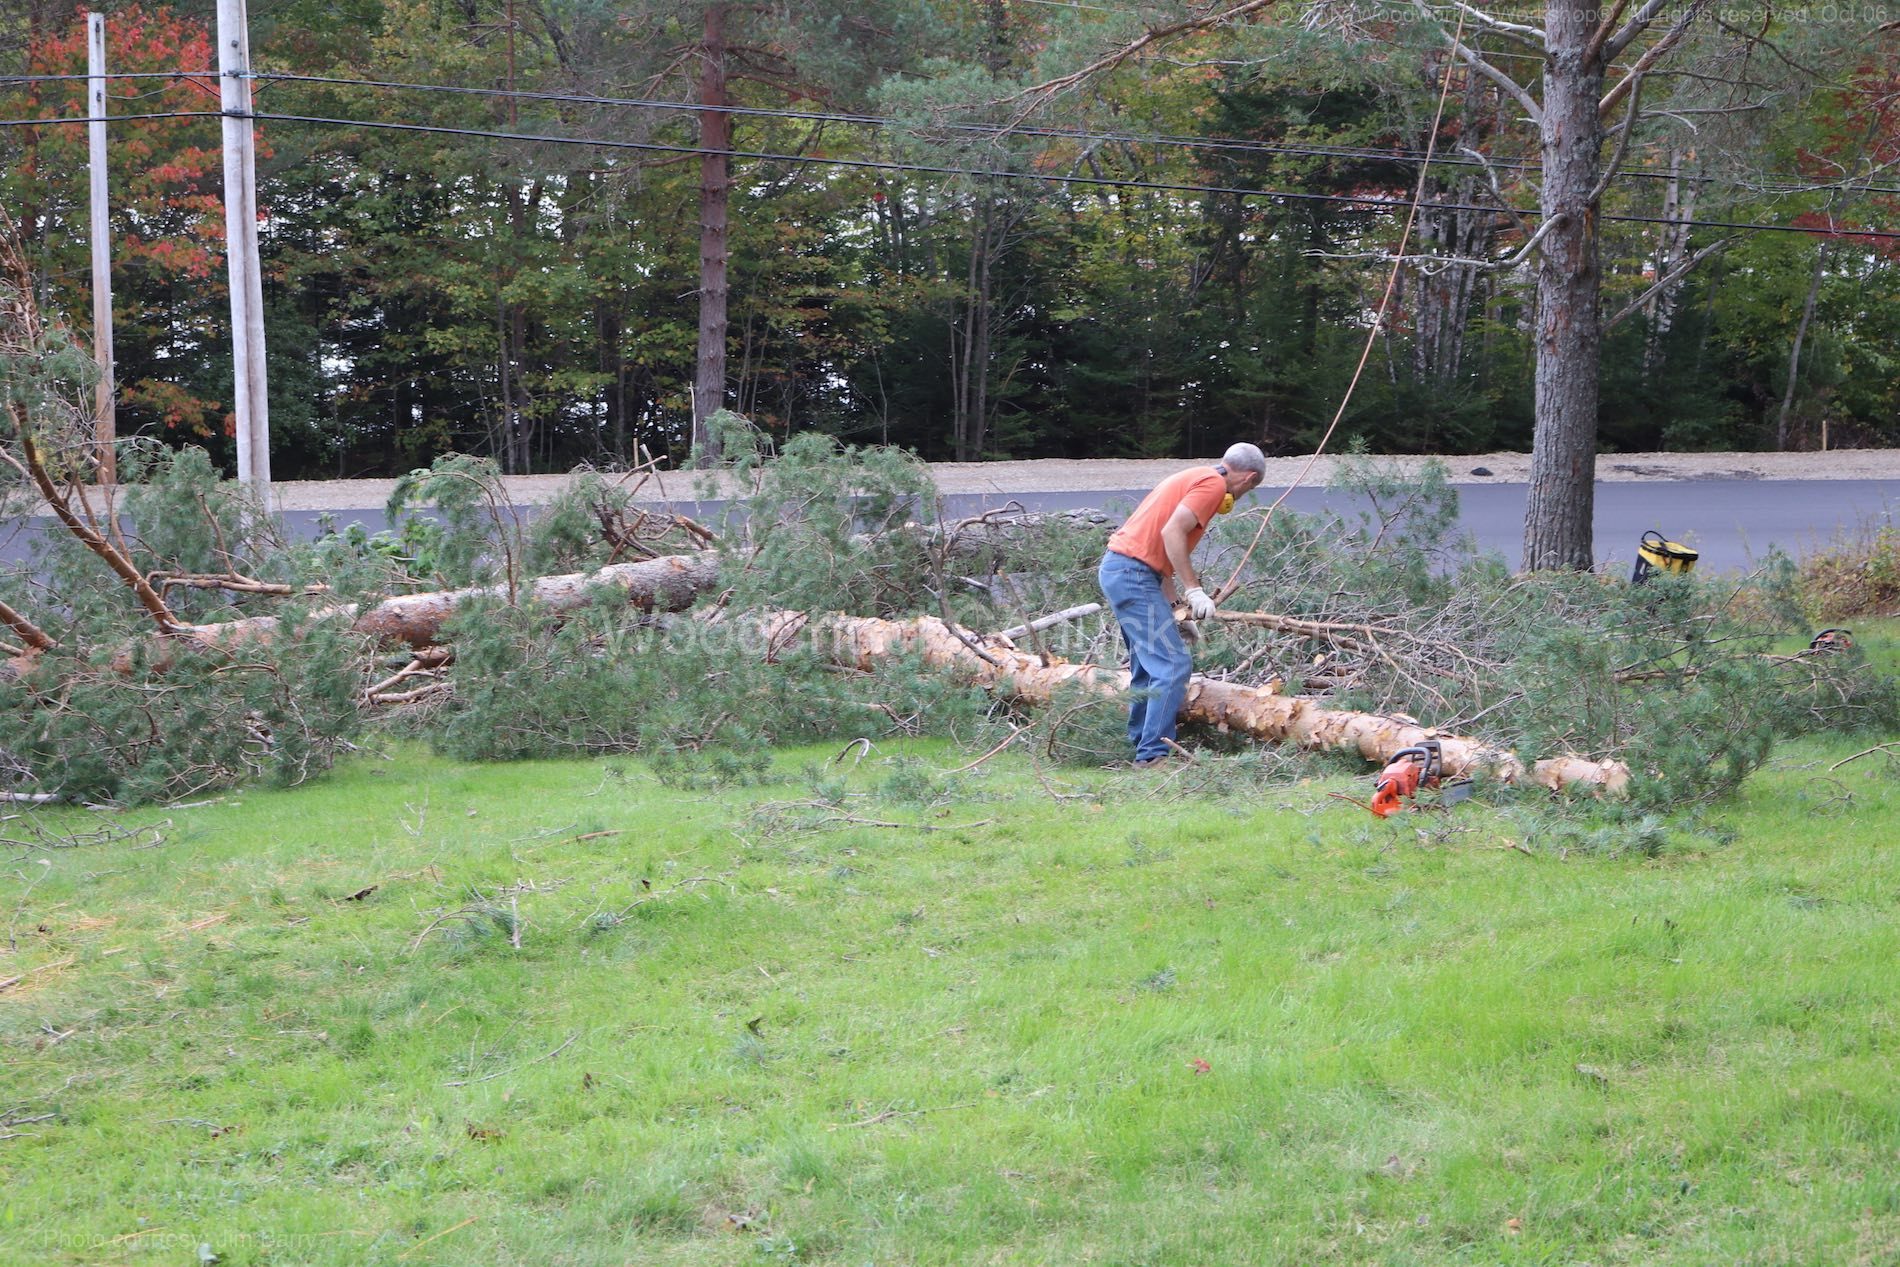 Bucking pine trees